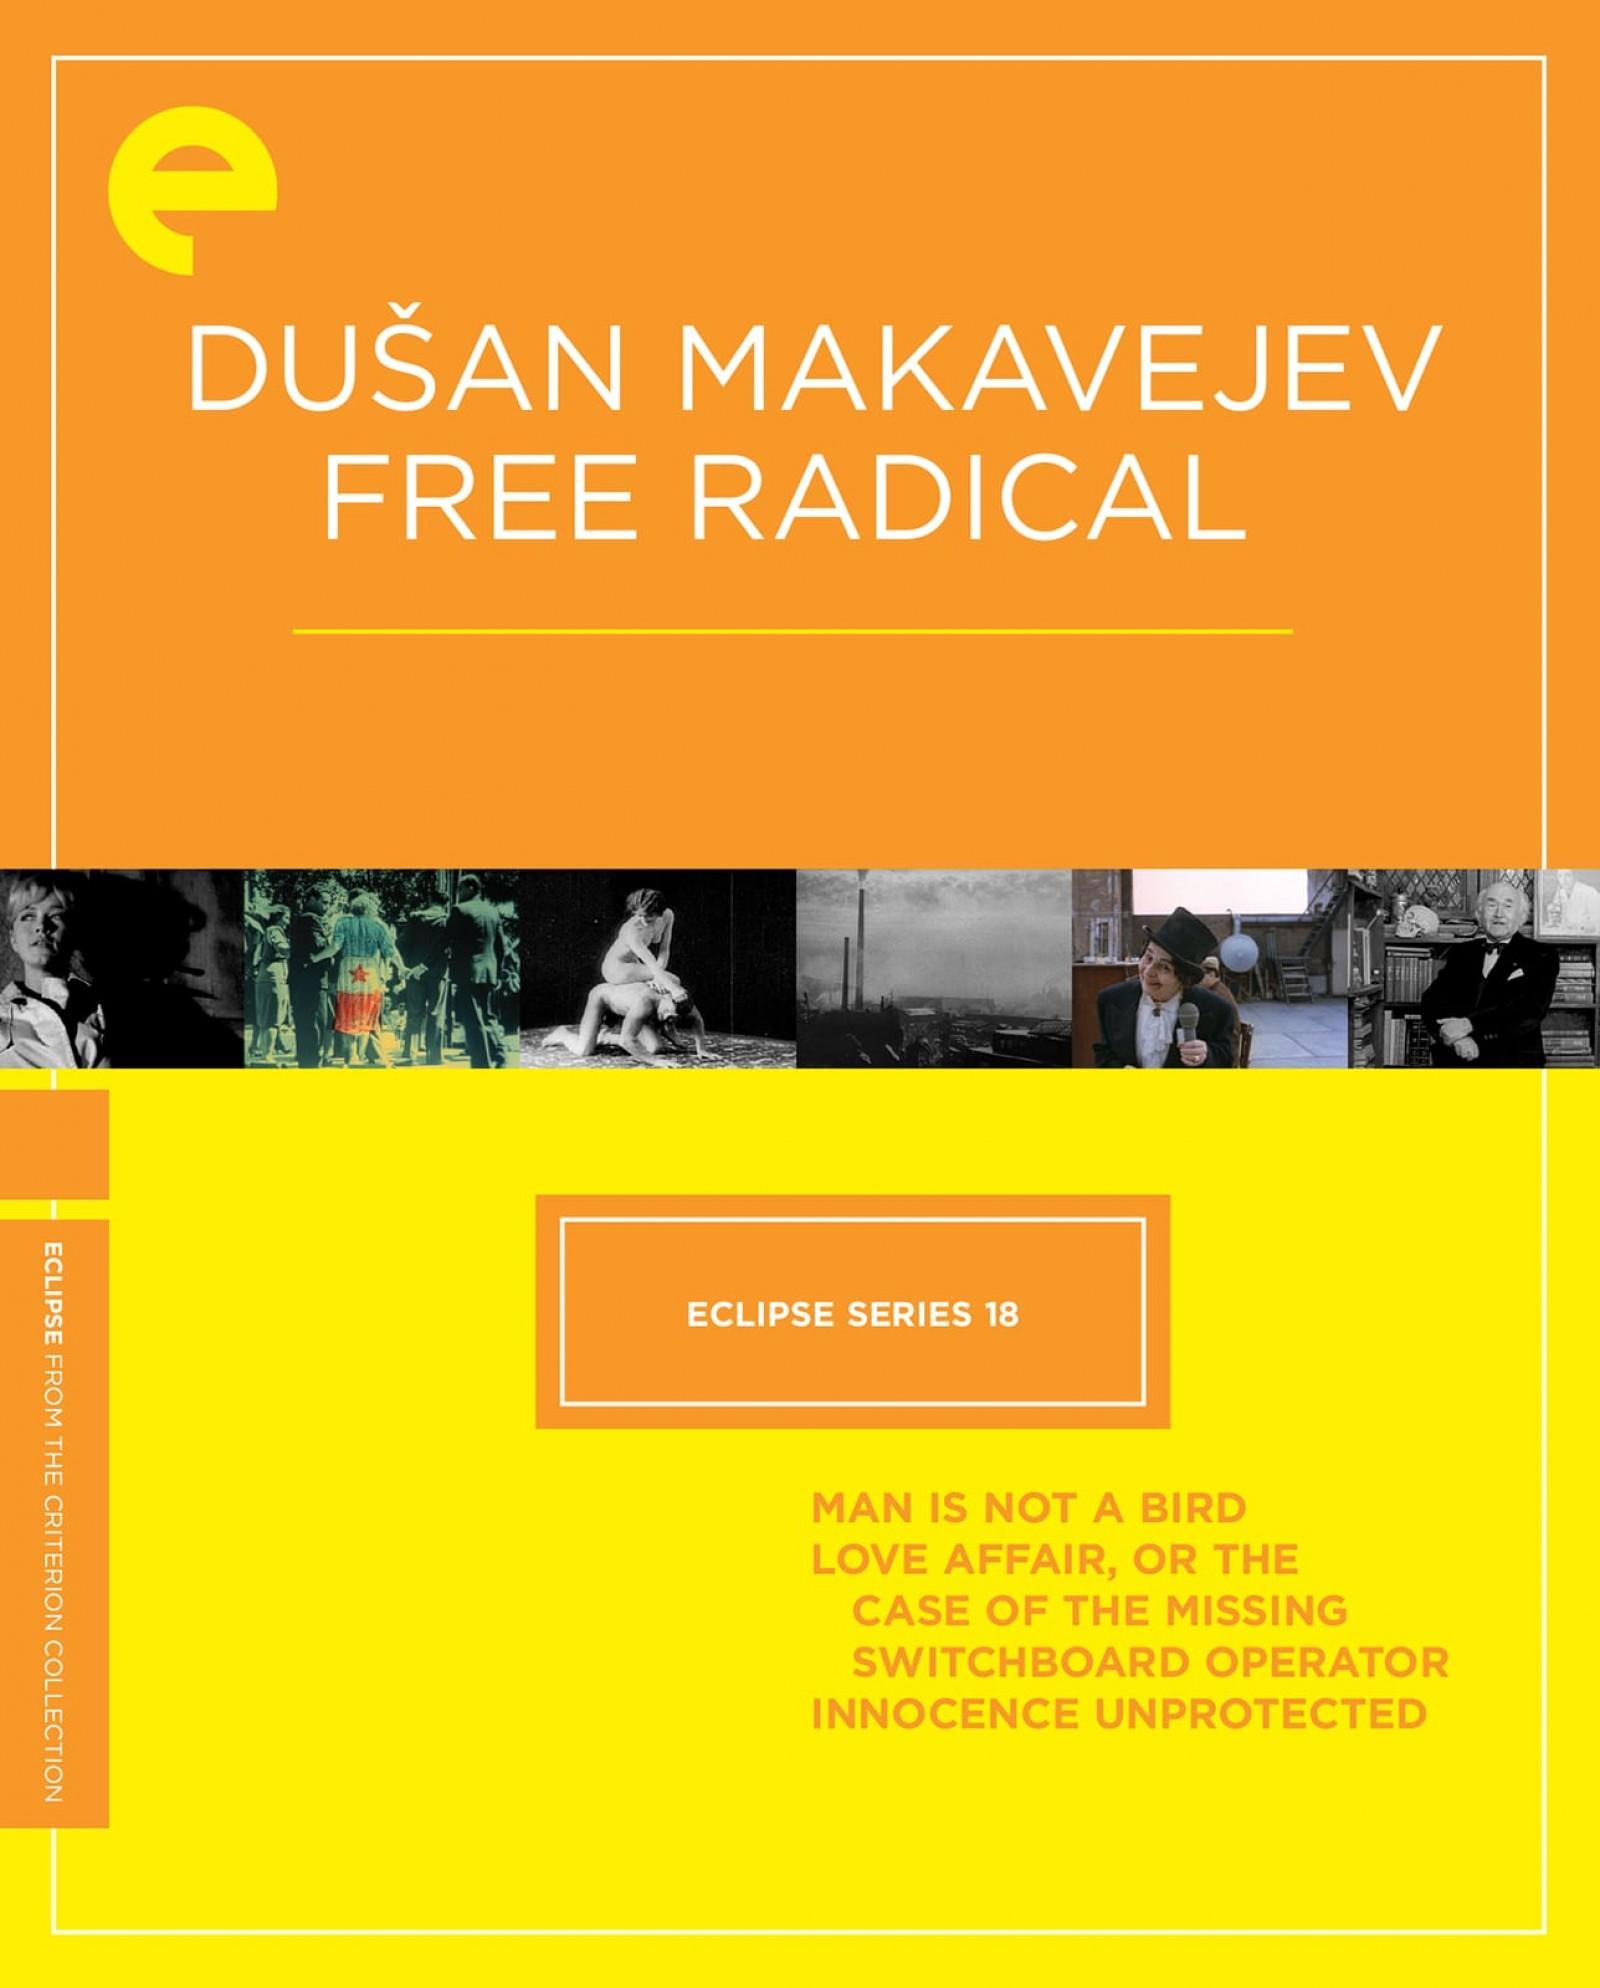 Eclipse Series 18: Dušan Makavejev—Free Radical